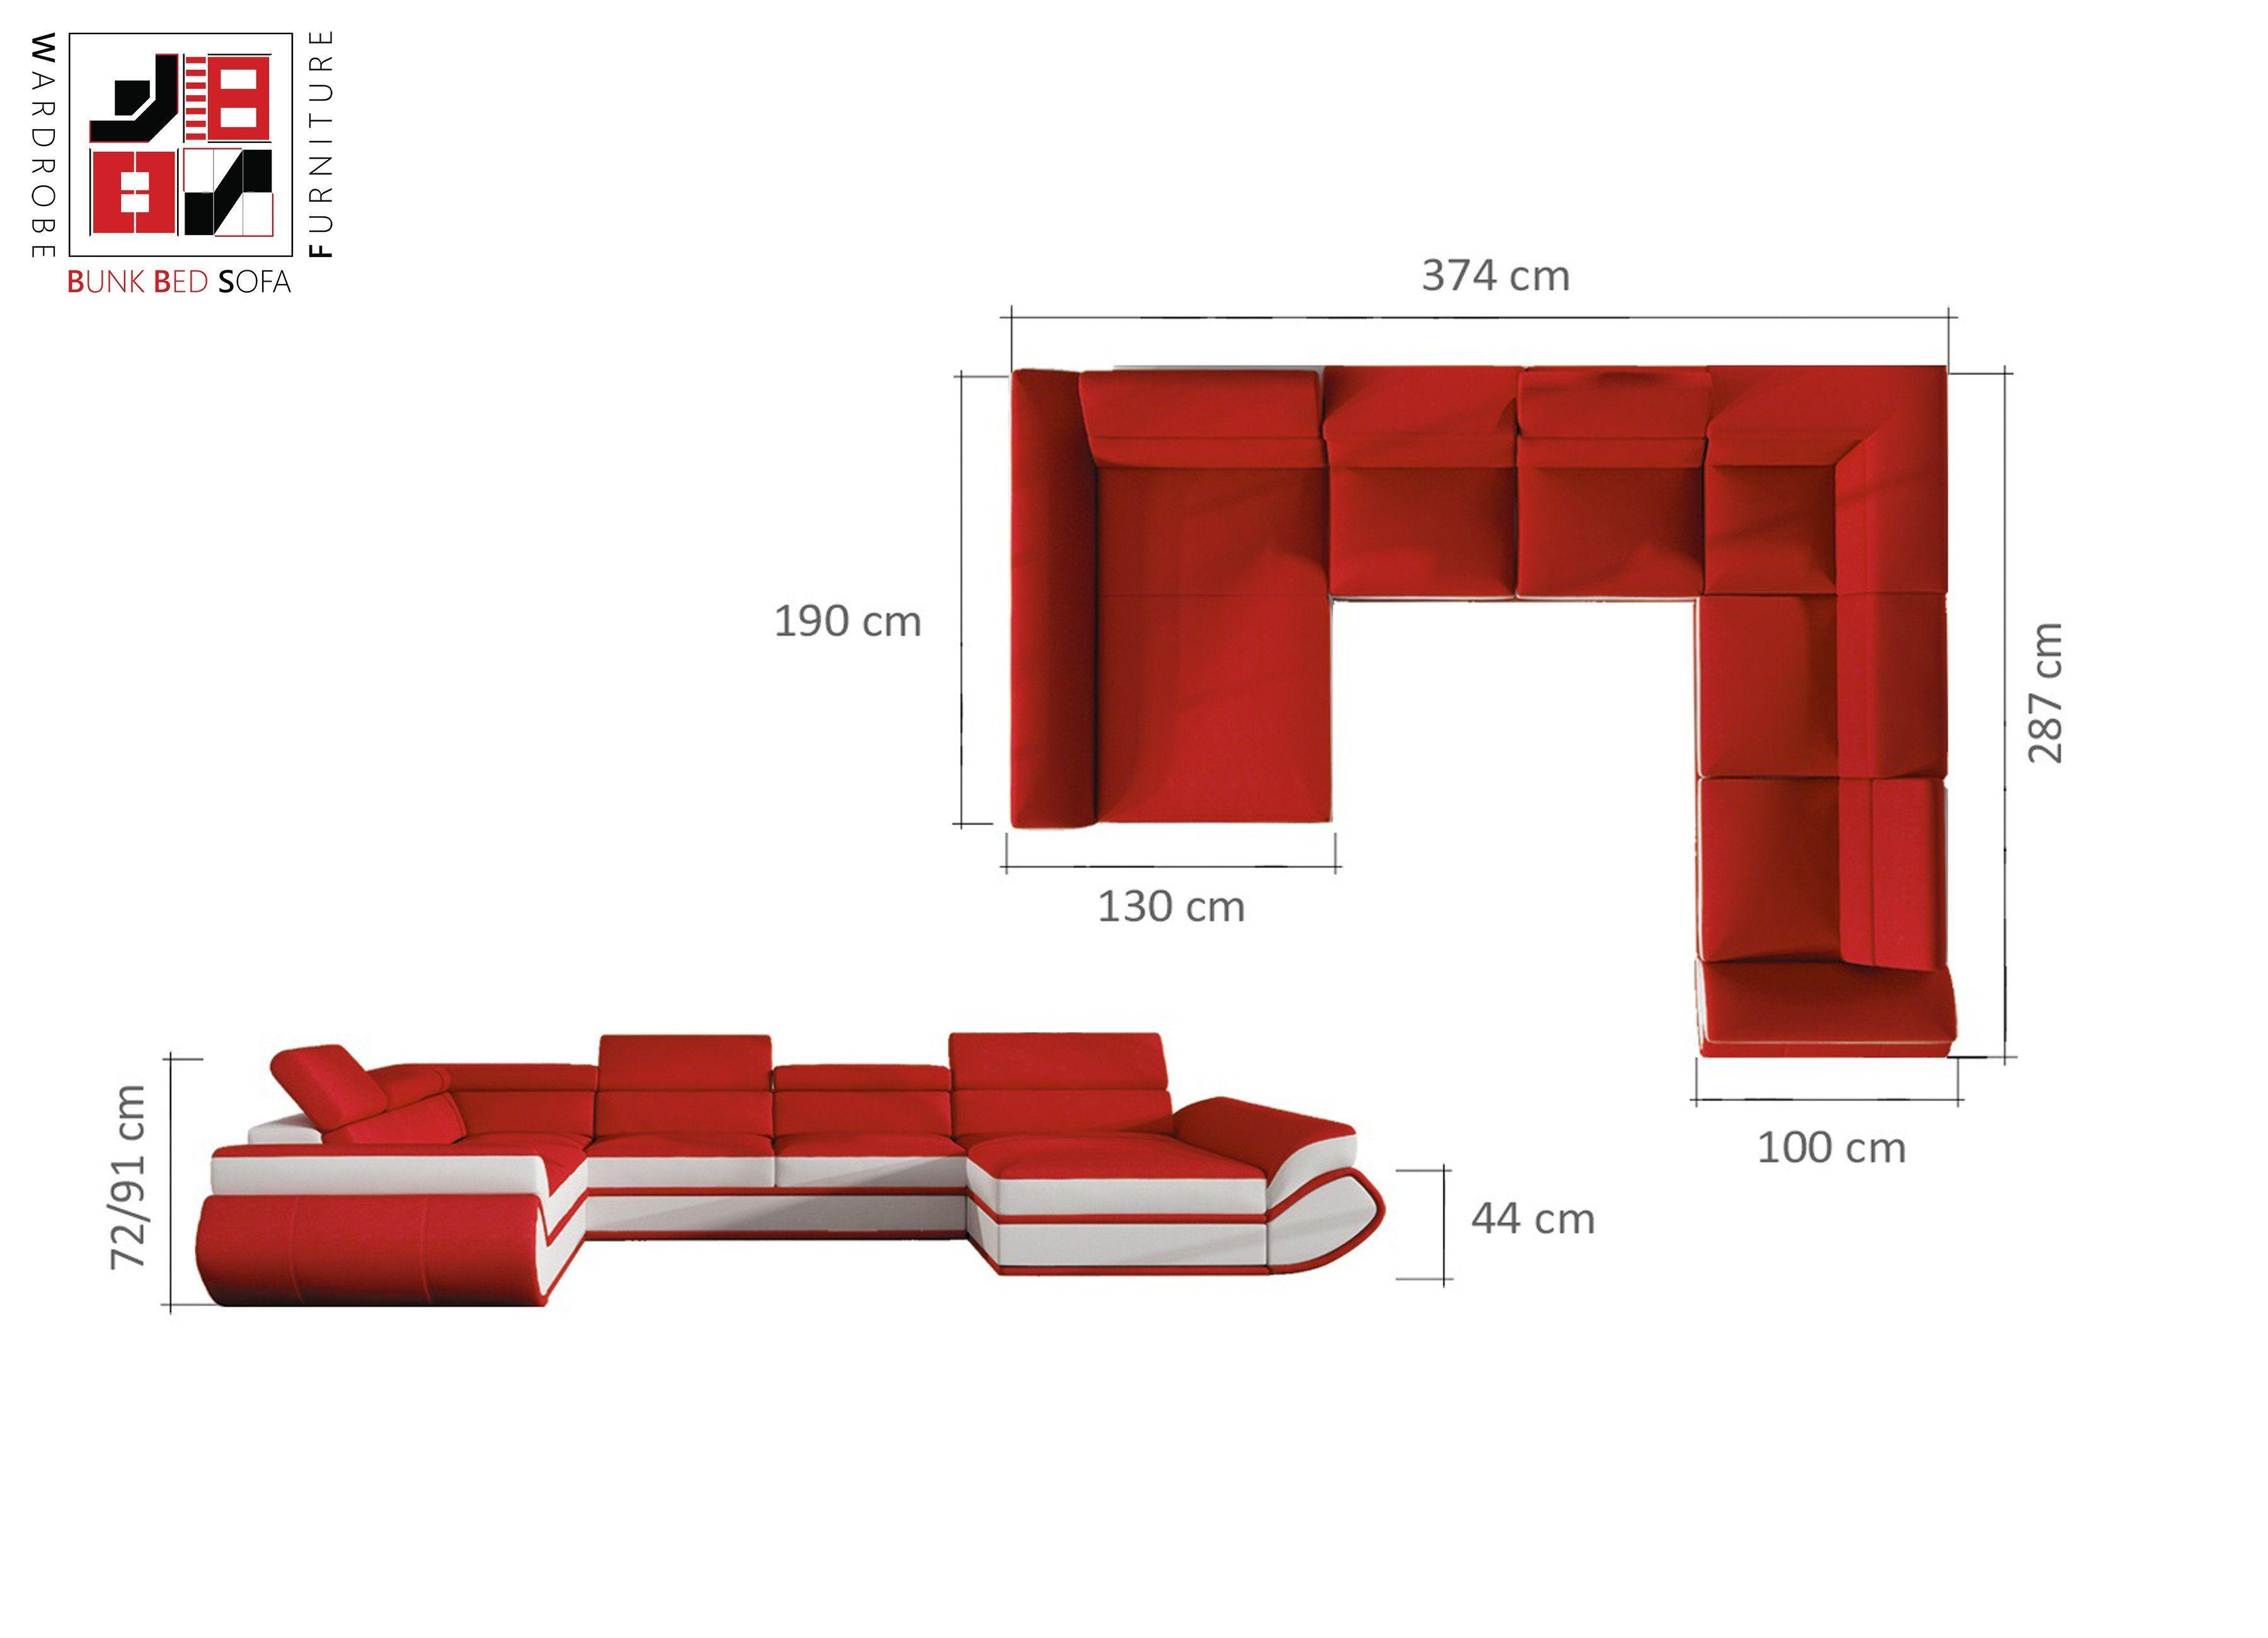 Universe Xl Luxury U Shape Sofa Bed For Extra Ordinary Folkes 374x287x190cm U Shaped Sofa Bed U Shaped Sofa Sofa Bed